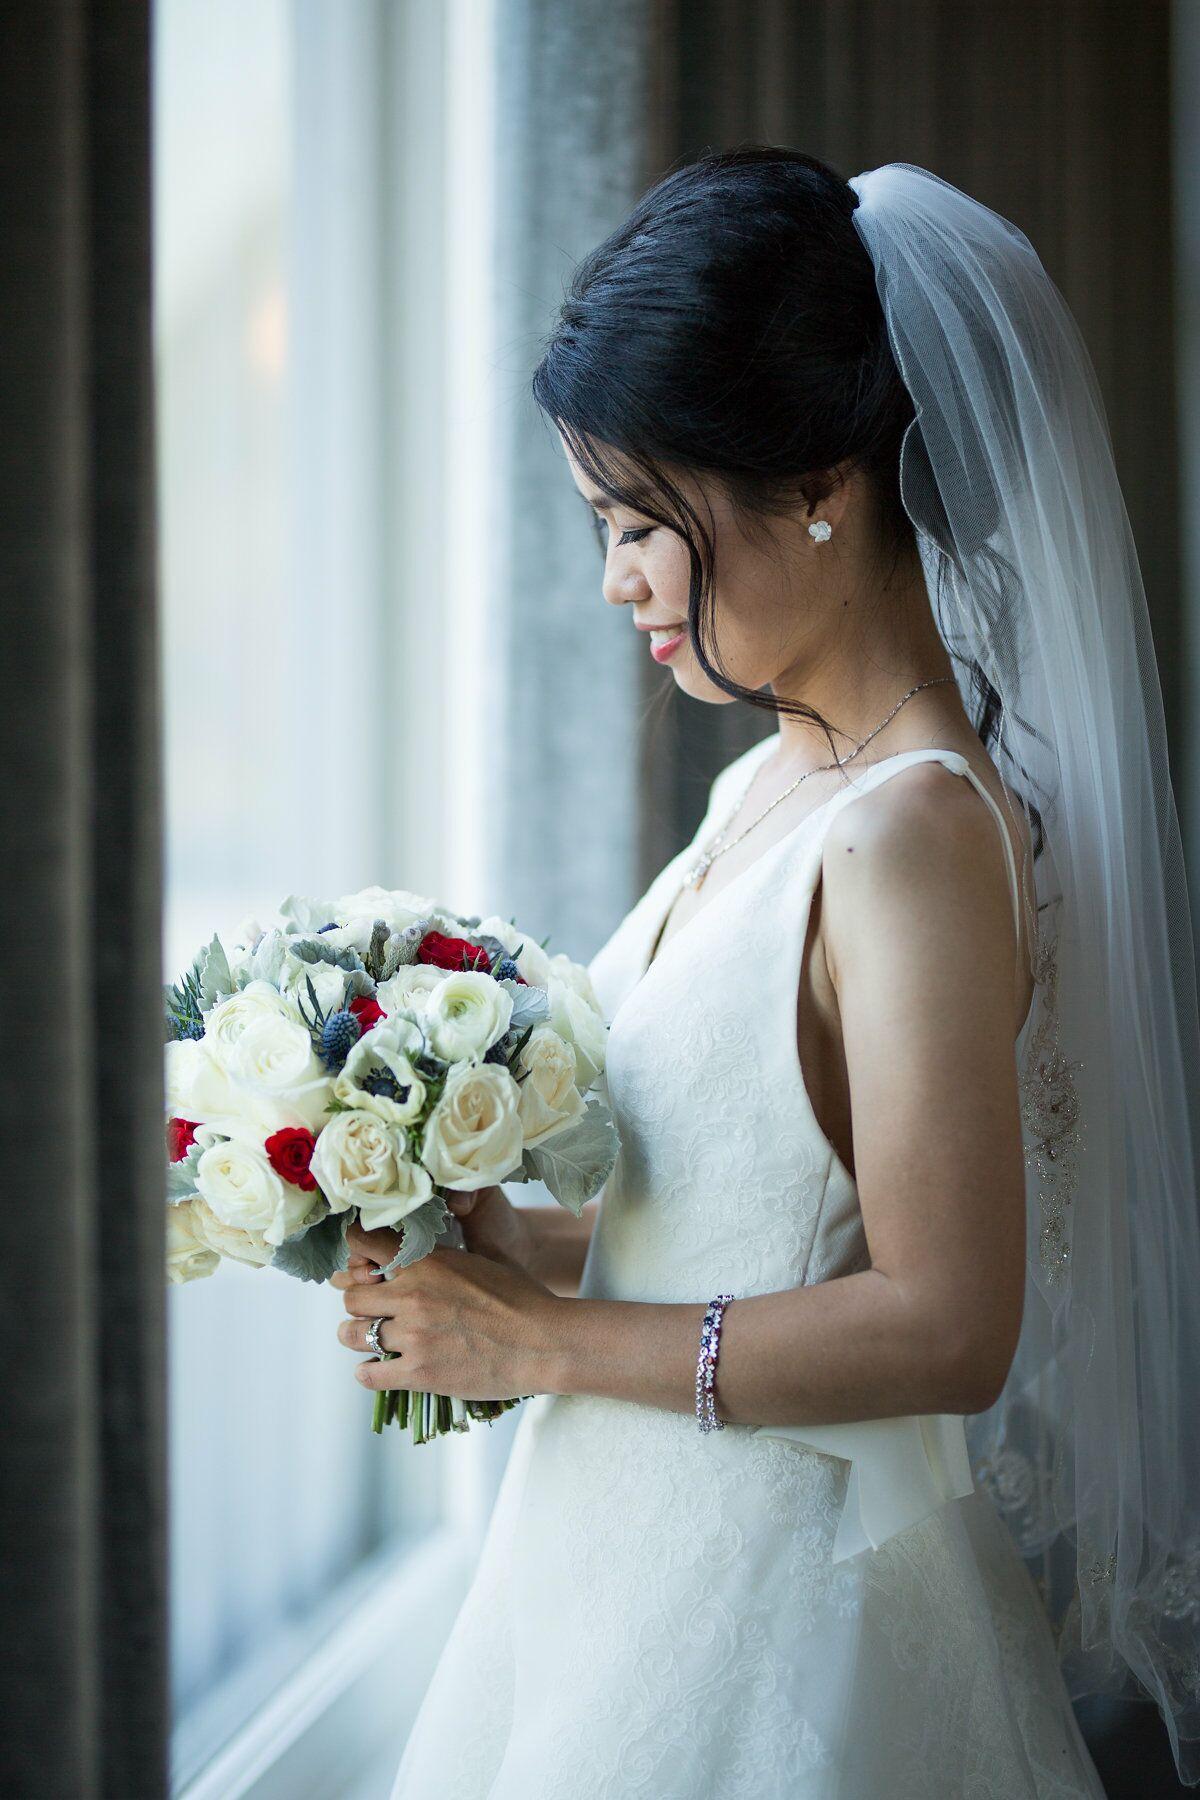 Unusual Wedding Dresses In Pasadena Images - Wedding Ideas ...